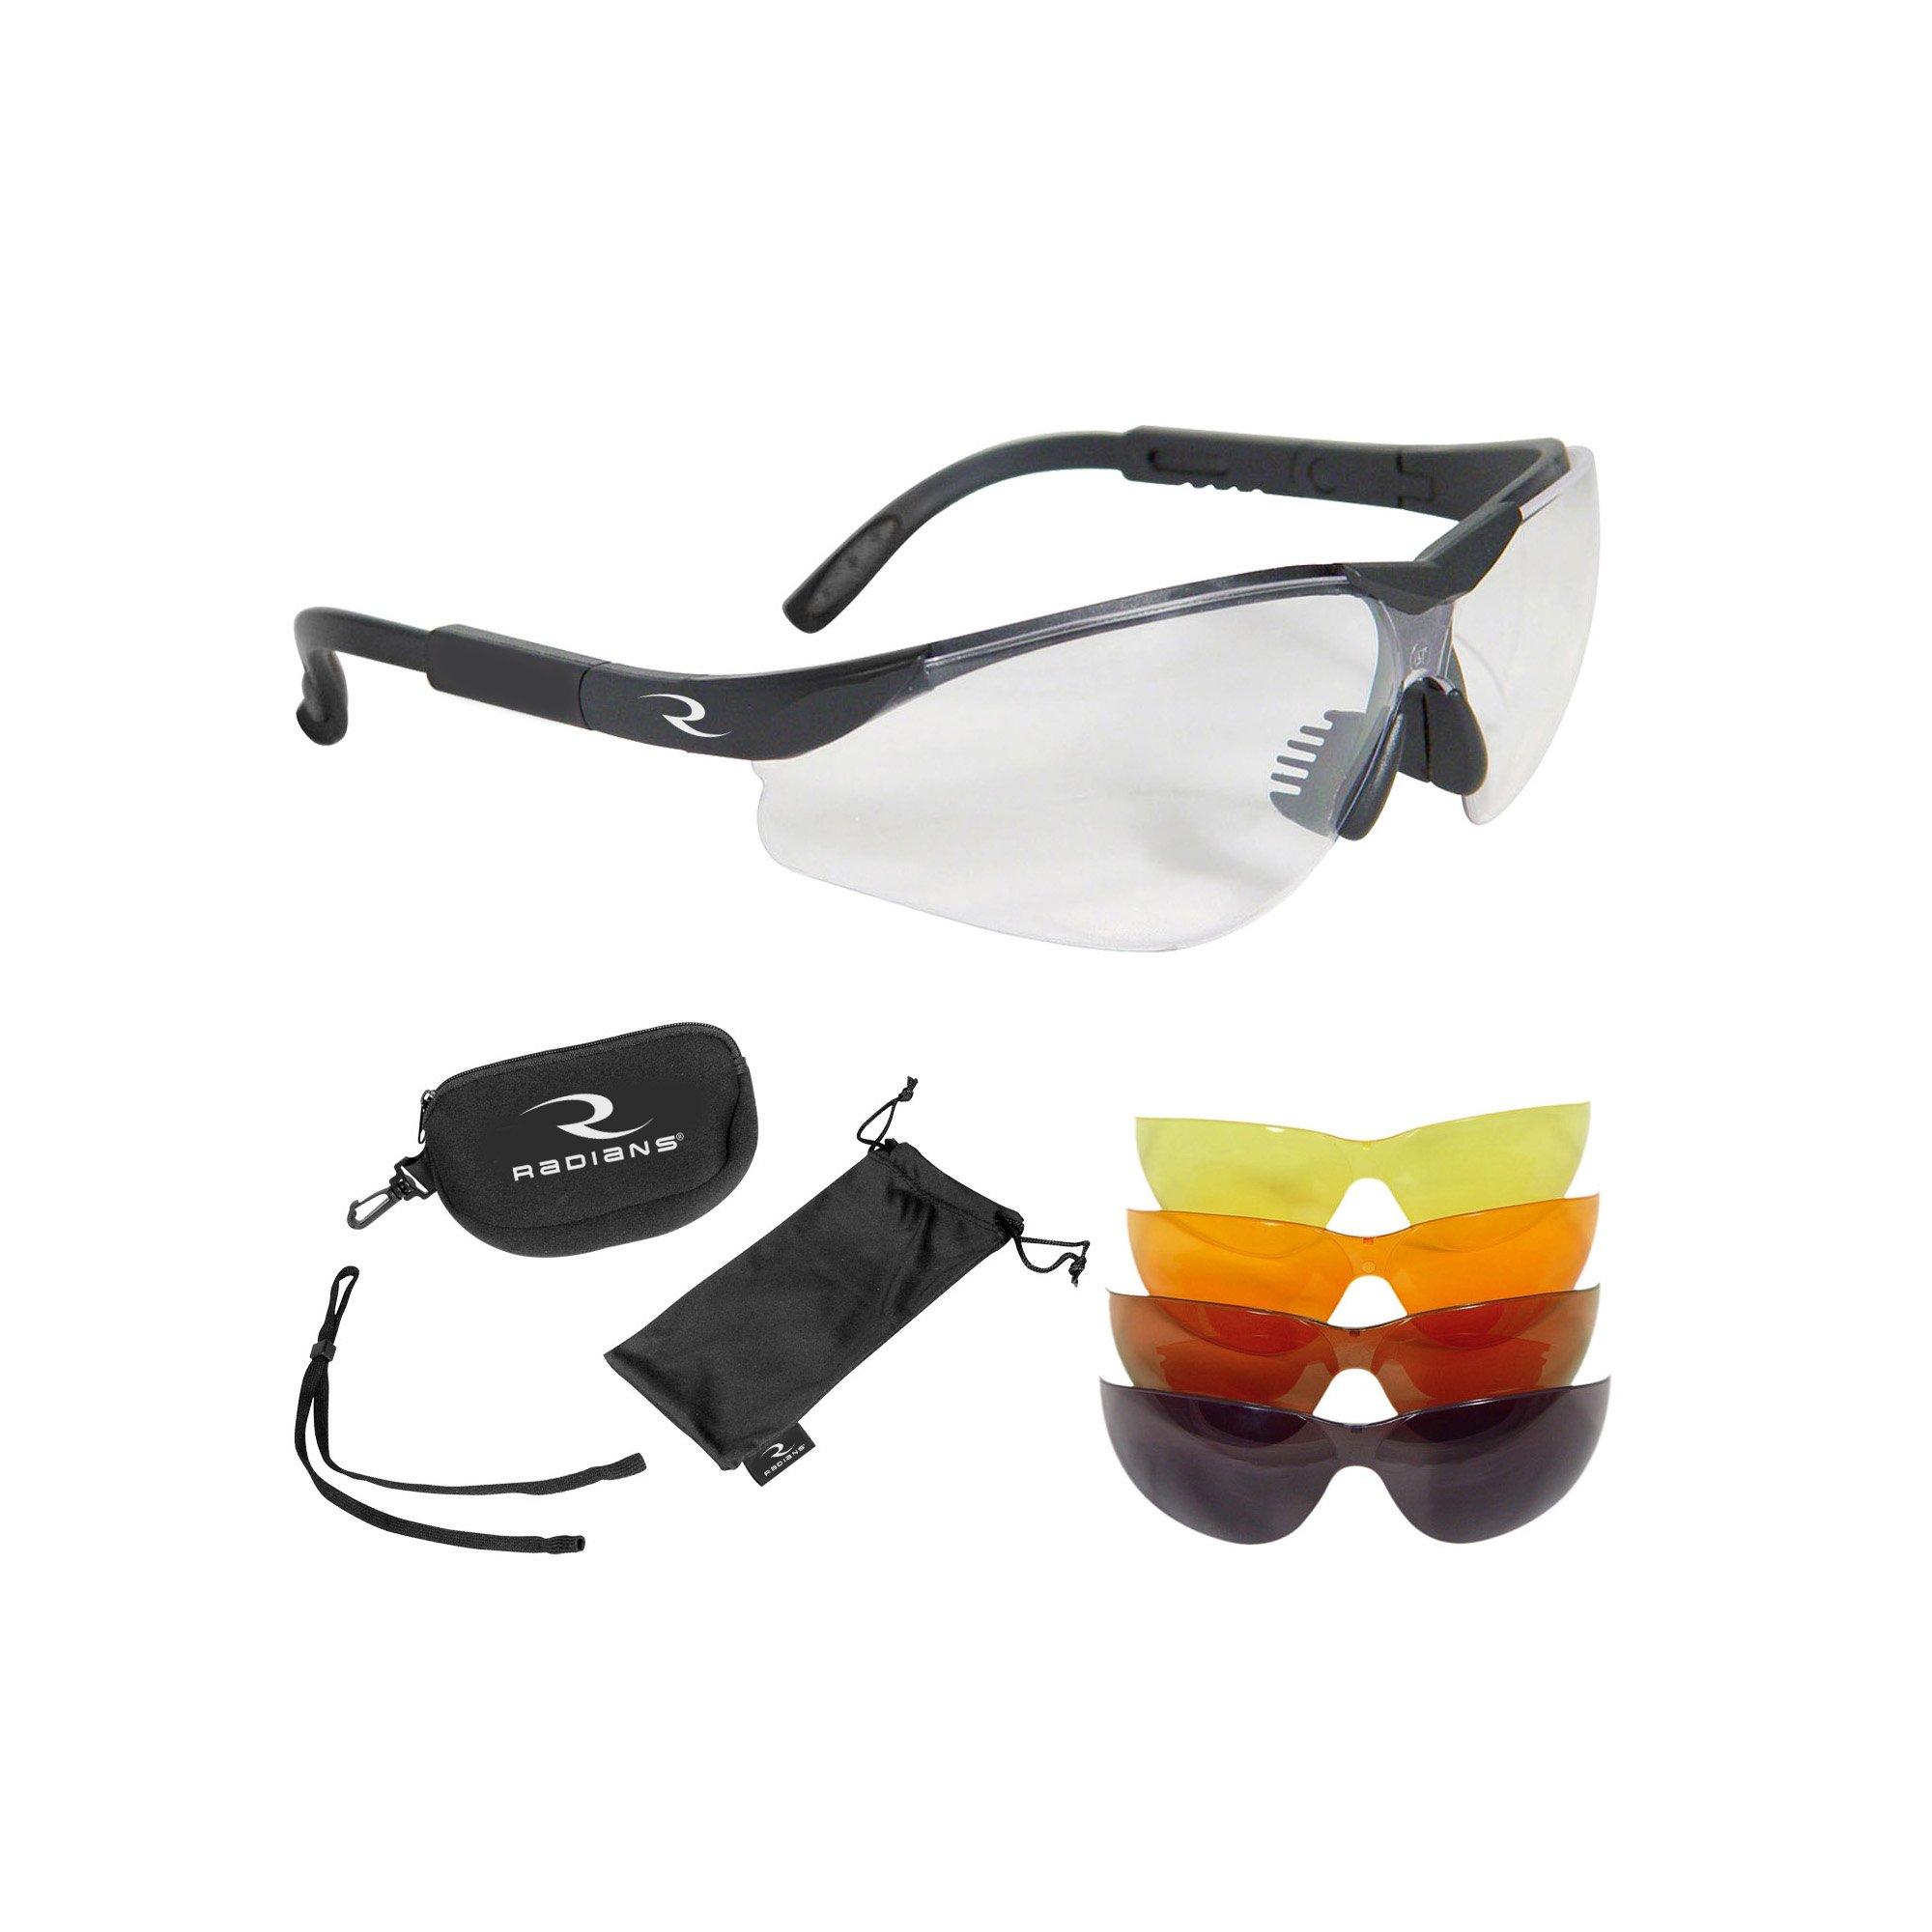 Radians T-85 Glasses with Case/Cloth Bag/Neck Cord, Black Frame, Clear/Copper/Amber/Orange/Green Mirror Lens